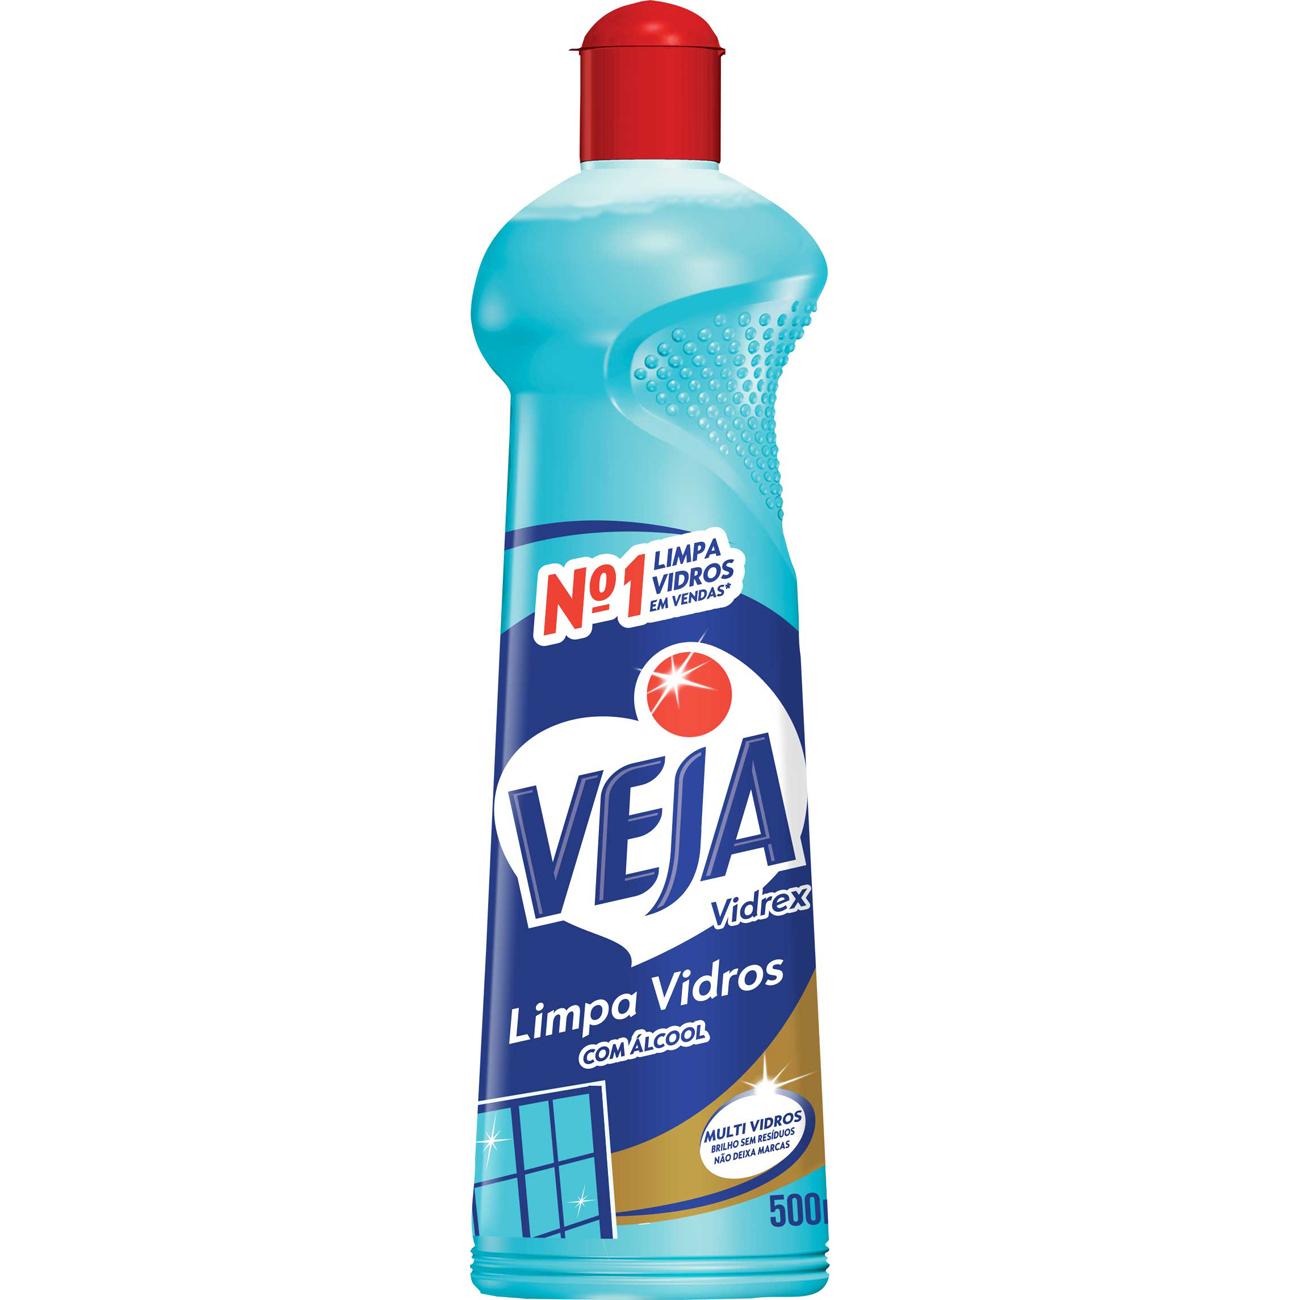 Limpa Vidro Veja Vidrex 500Ml Alcool